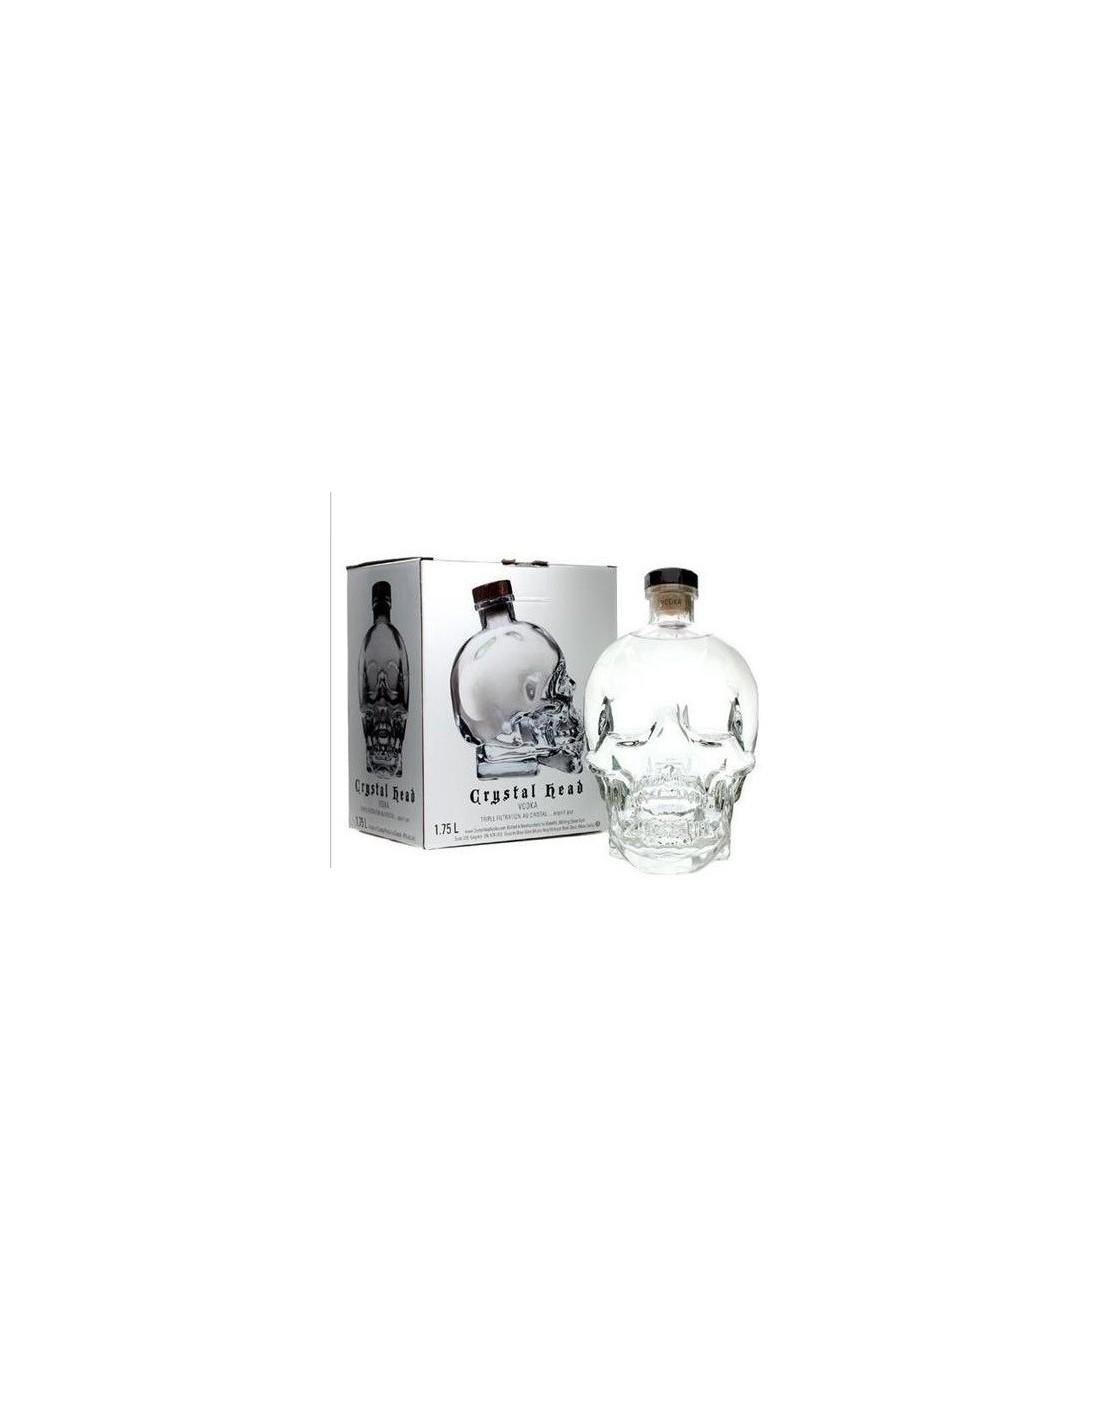 Vodca Crystal Head 1.75L, 40% alc., Canada